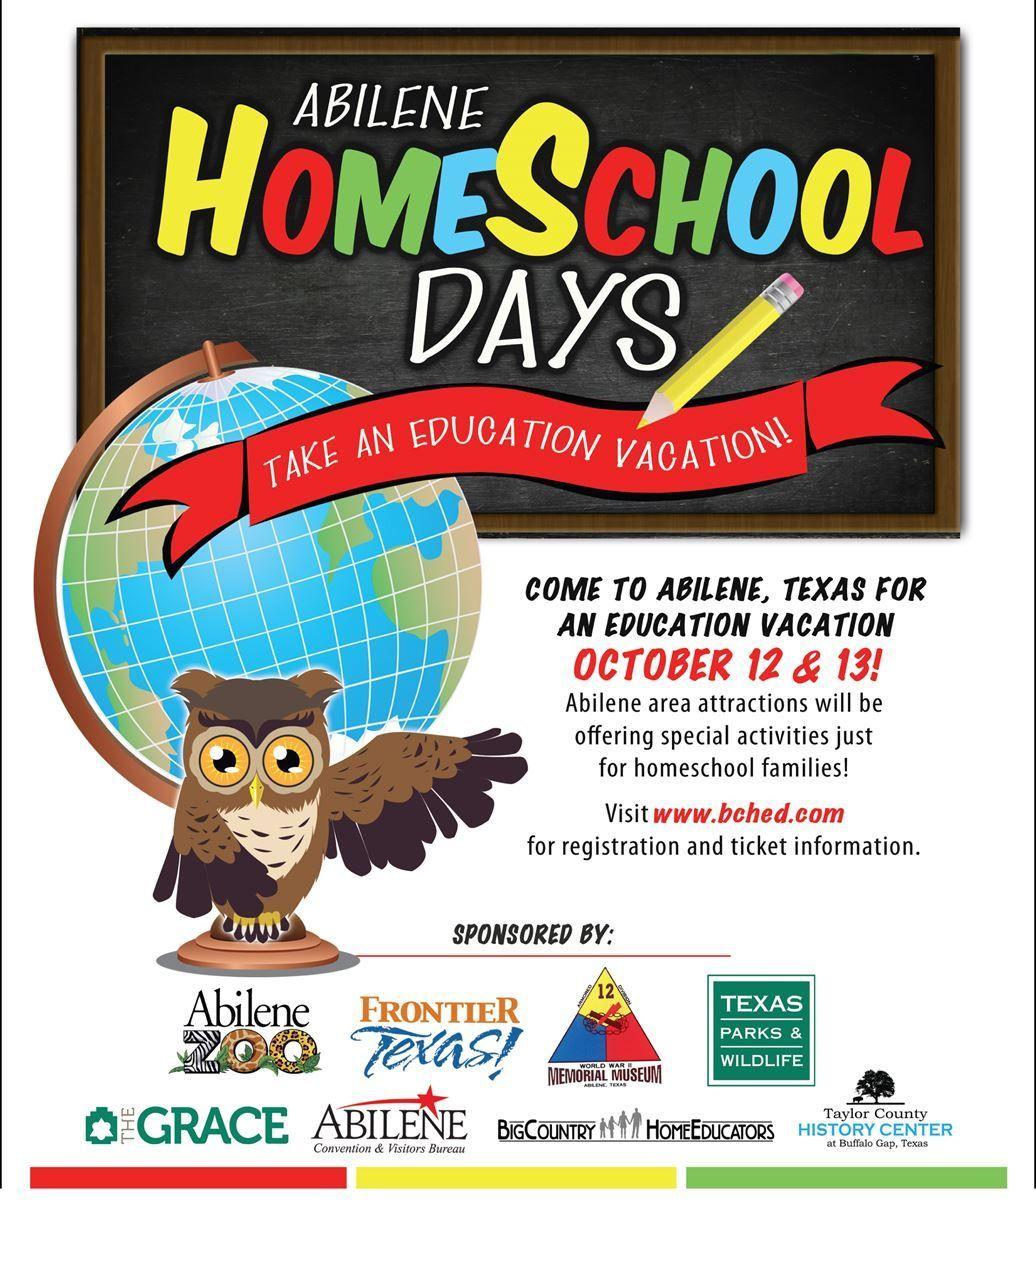 Big Country Home Educators ABILENE HOMESCHOOL DAYS